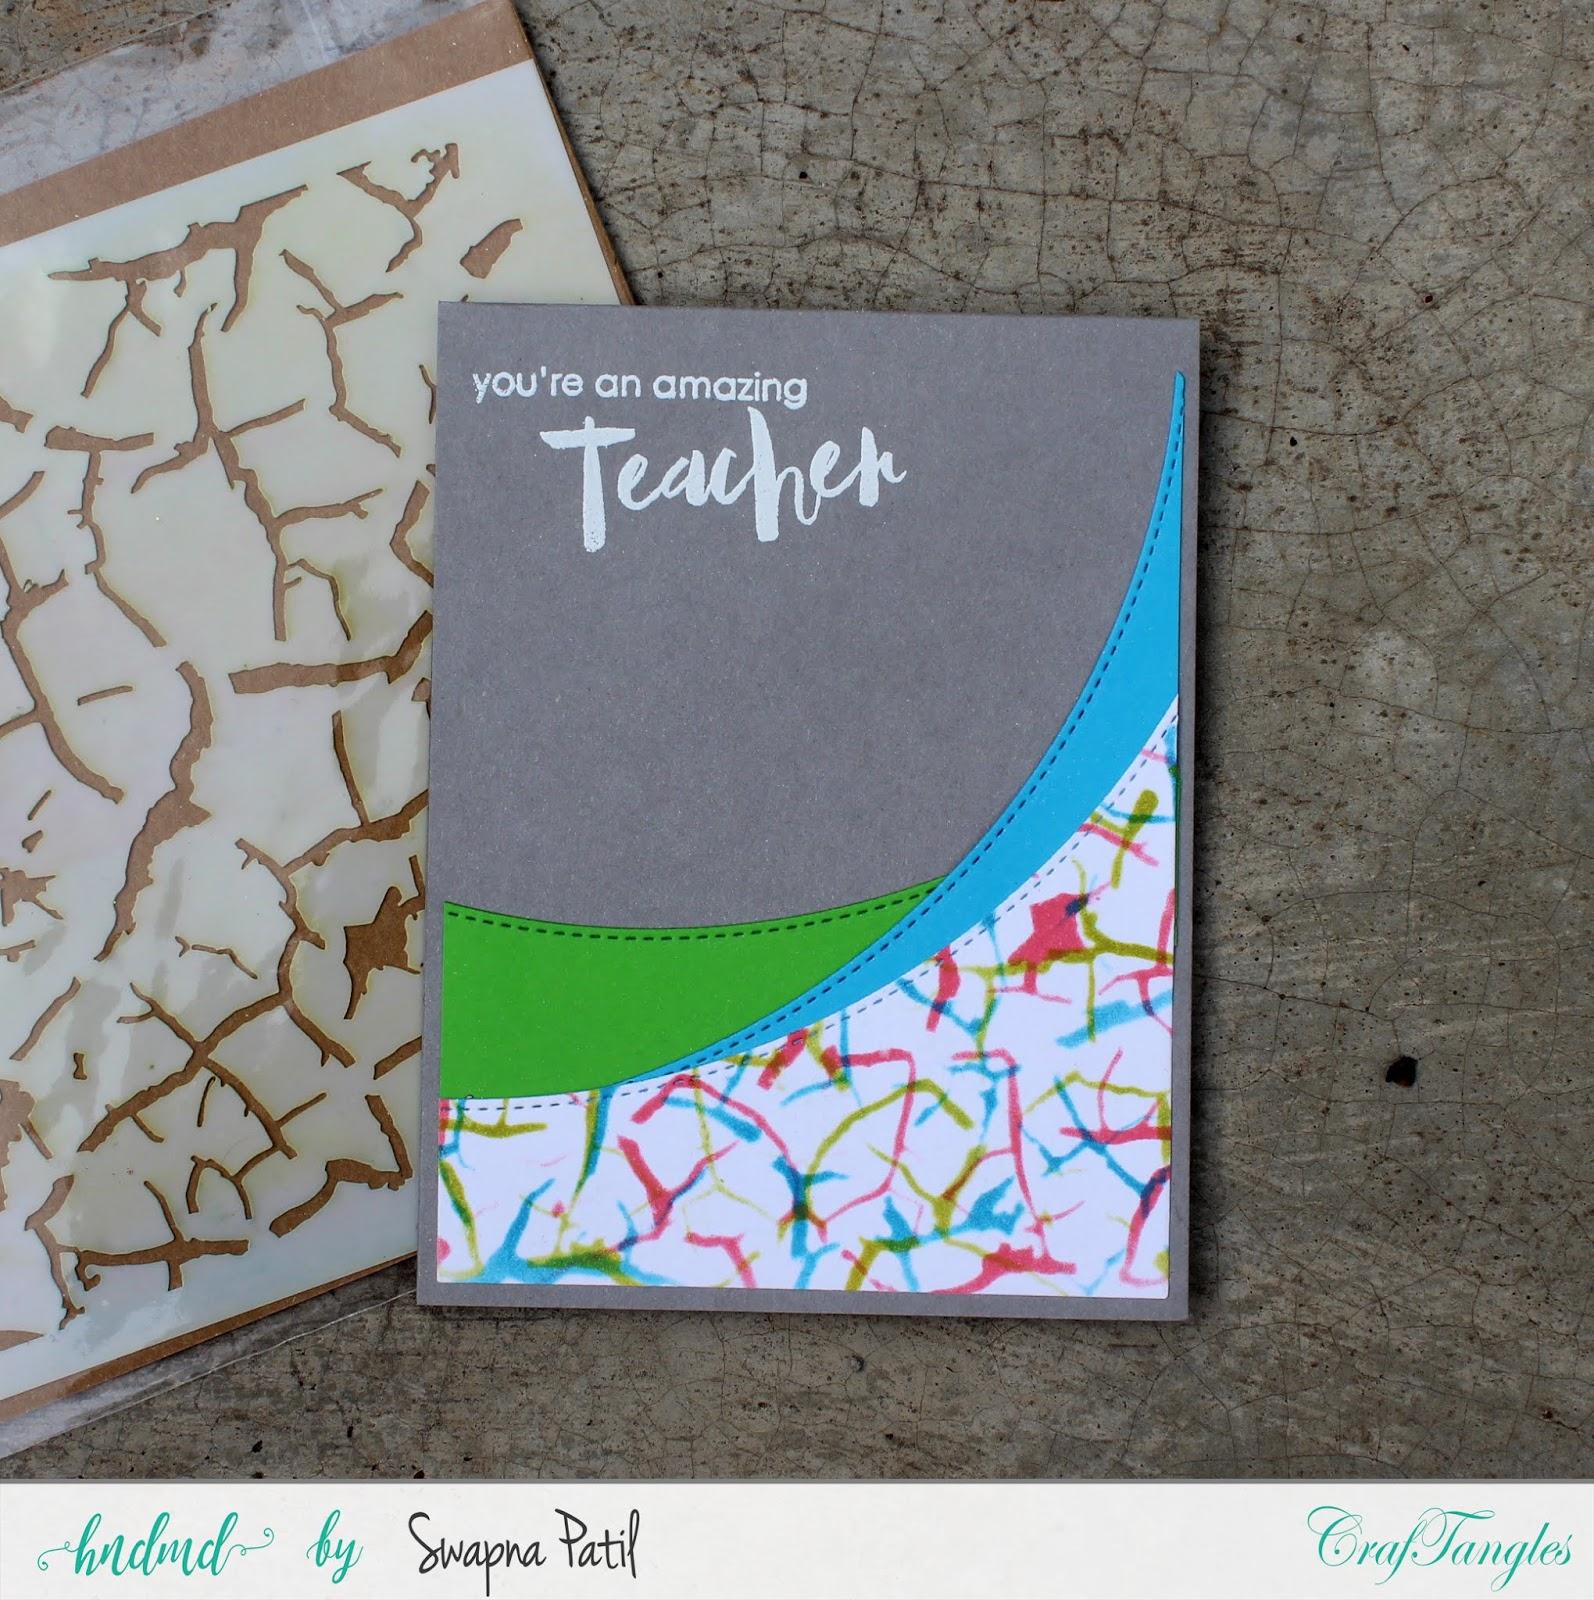 Cards for Teachers - Swapna Patil 2